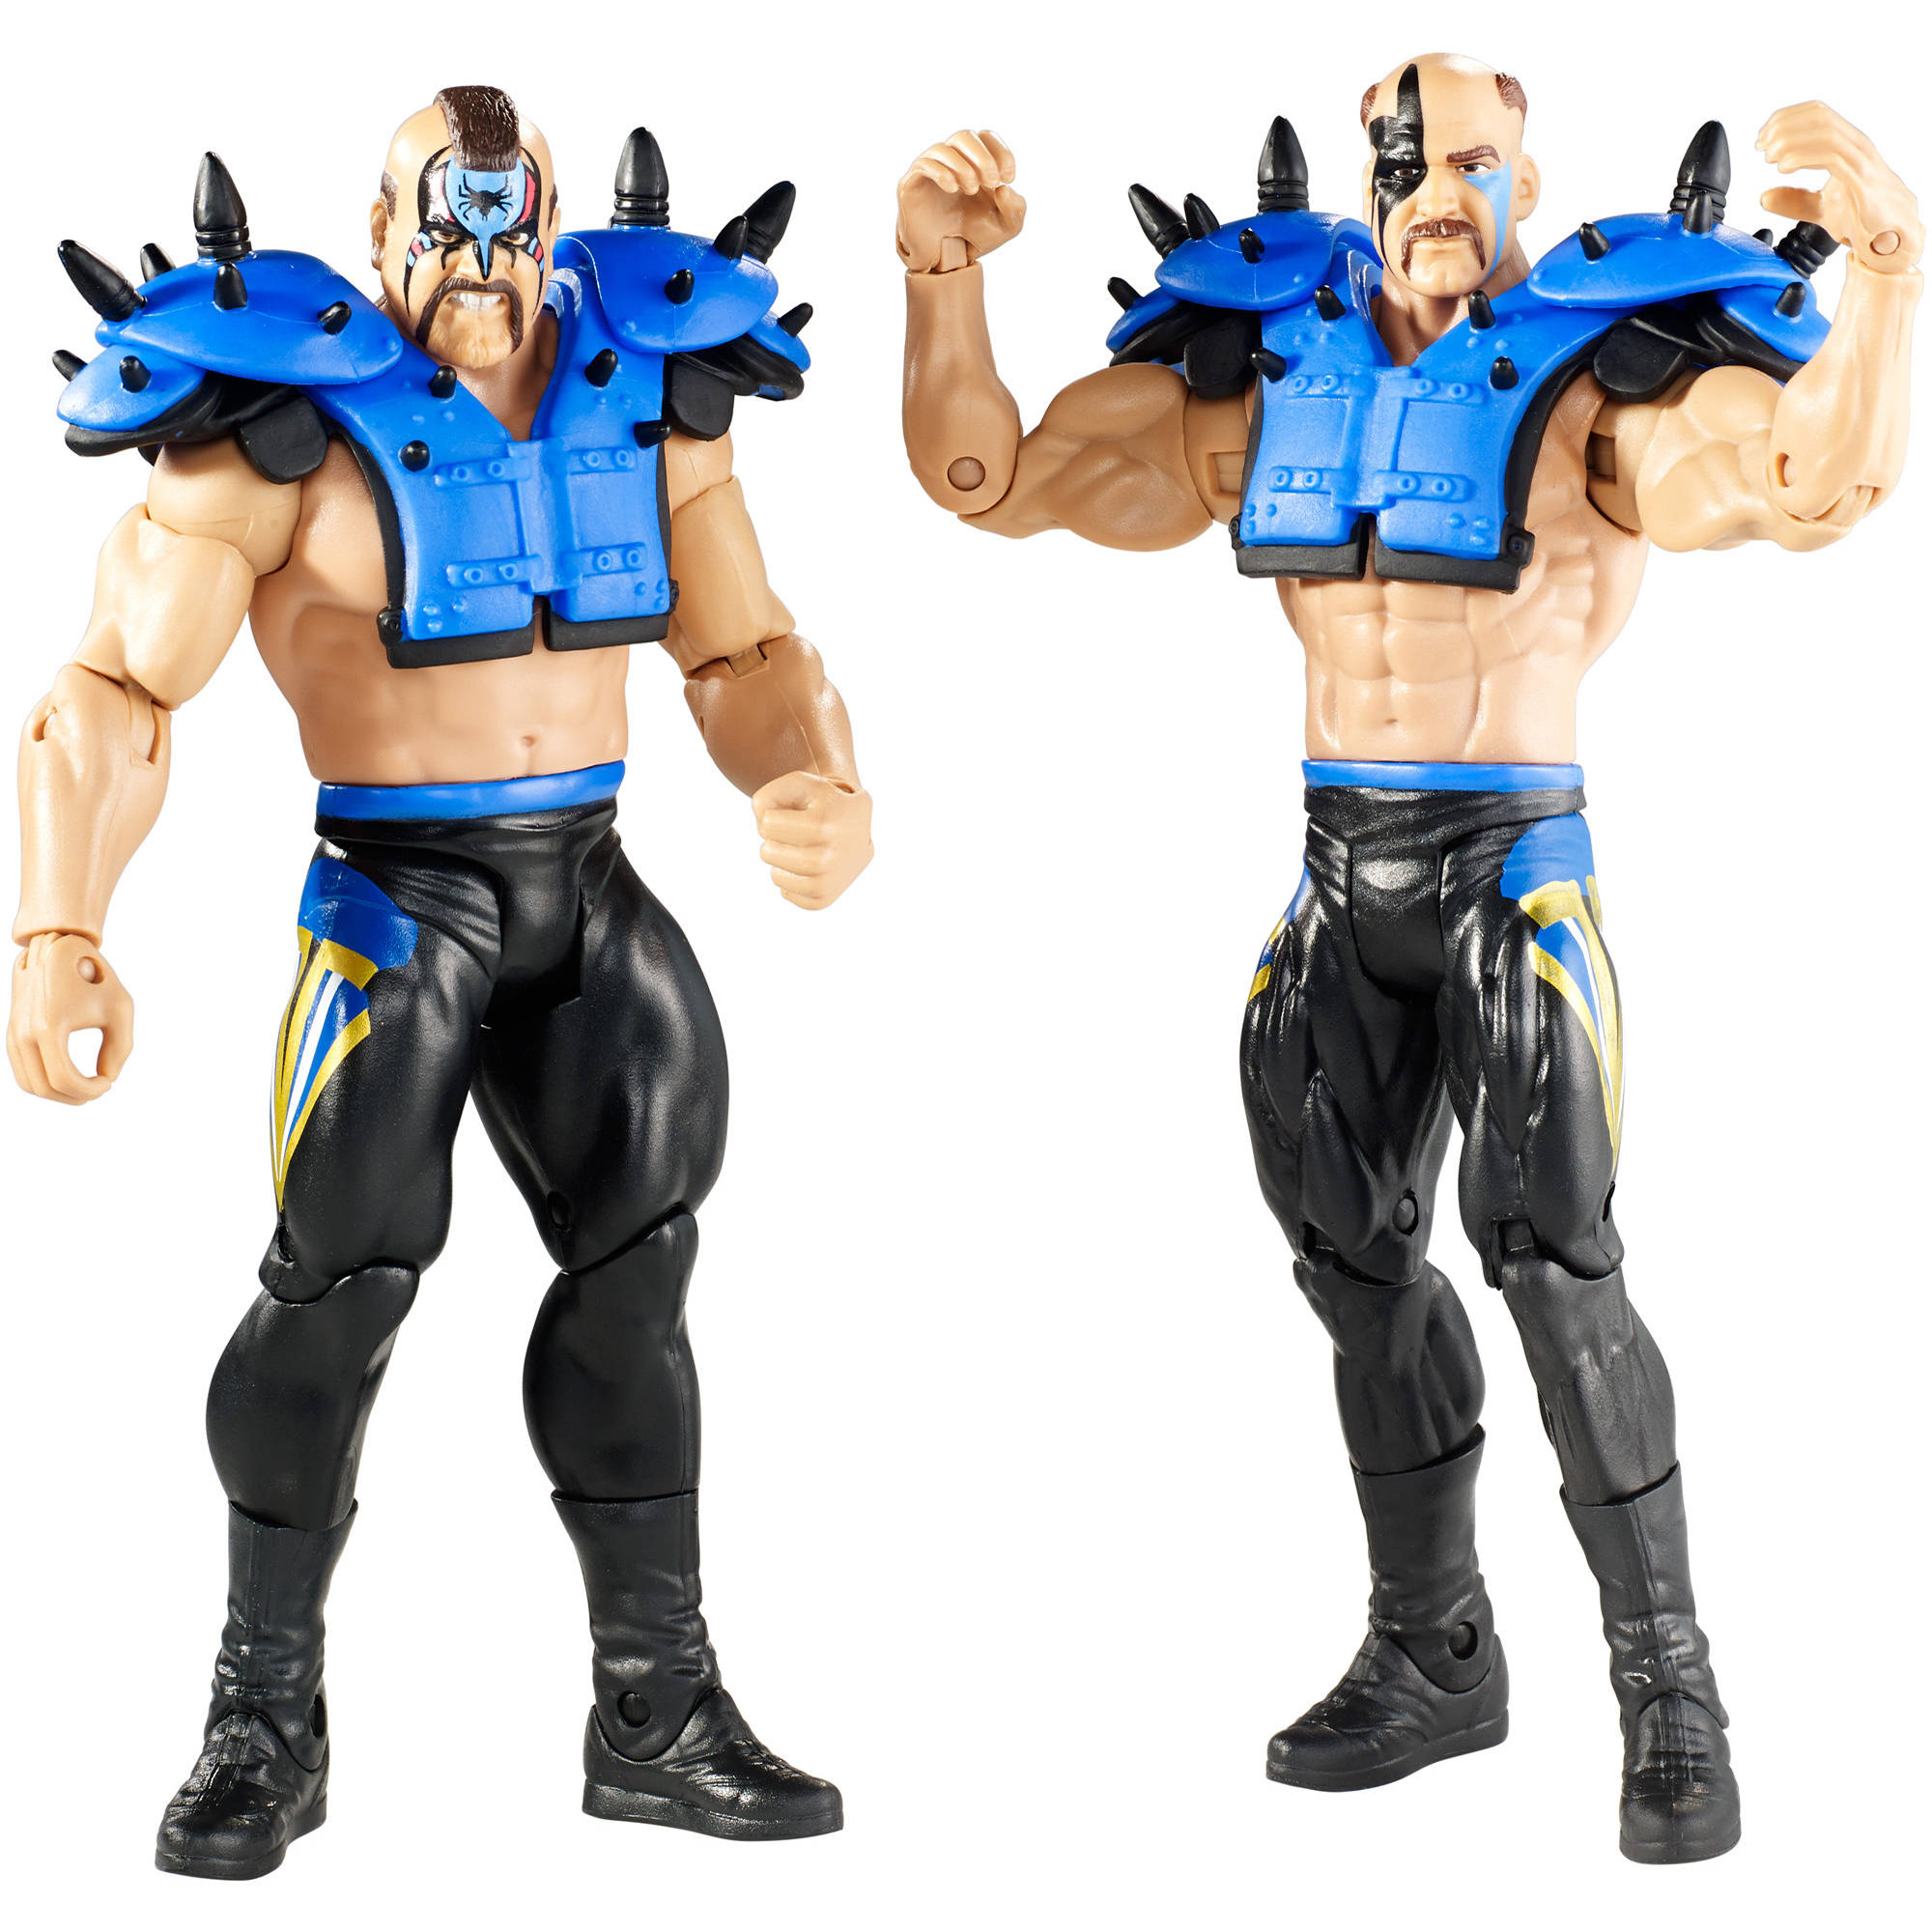 WWE Road Warriors Battle Pack